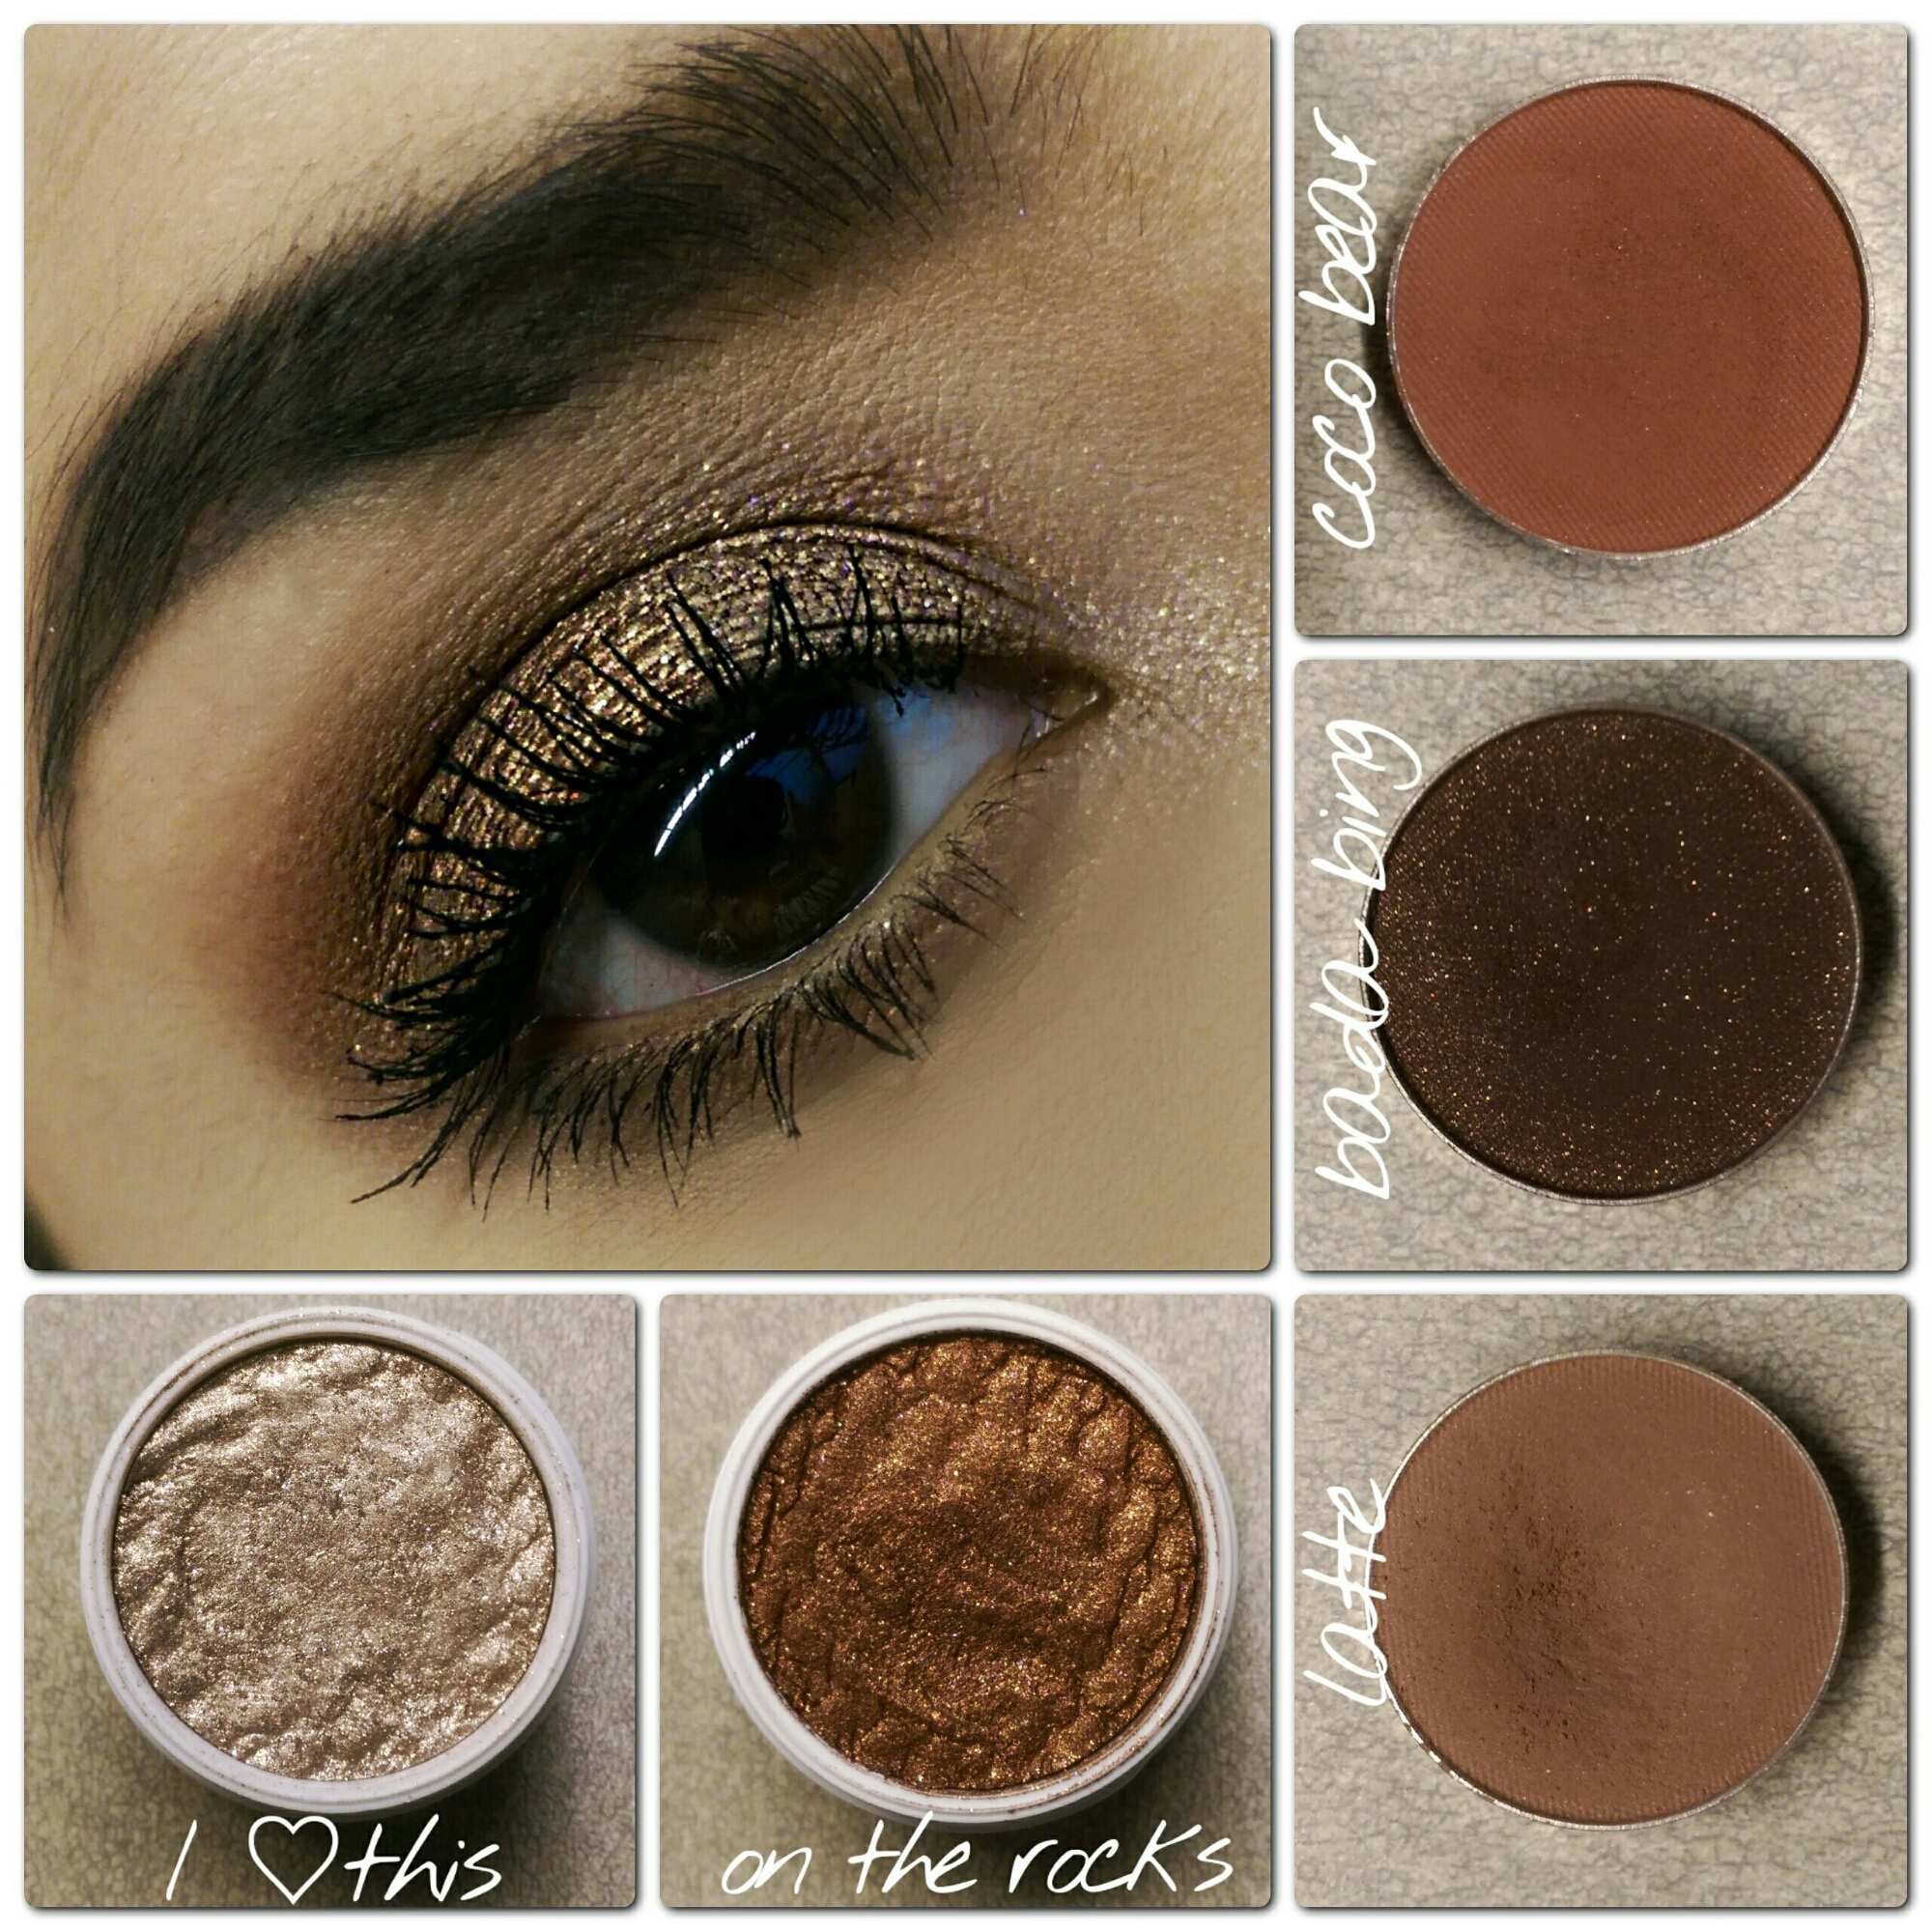 MakeupGeek Cosmetics ColourPop Cosmetics cruelty free makeup warm brown smokey eyes MOTD